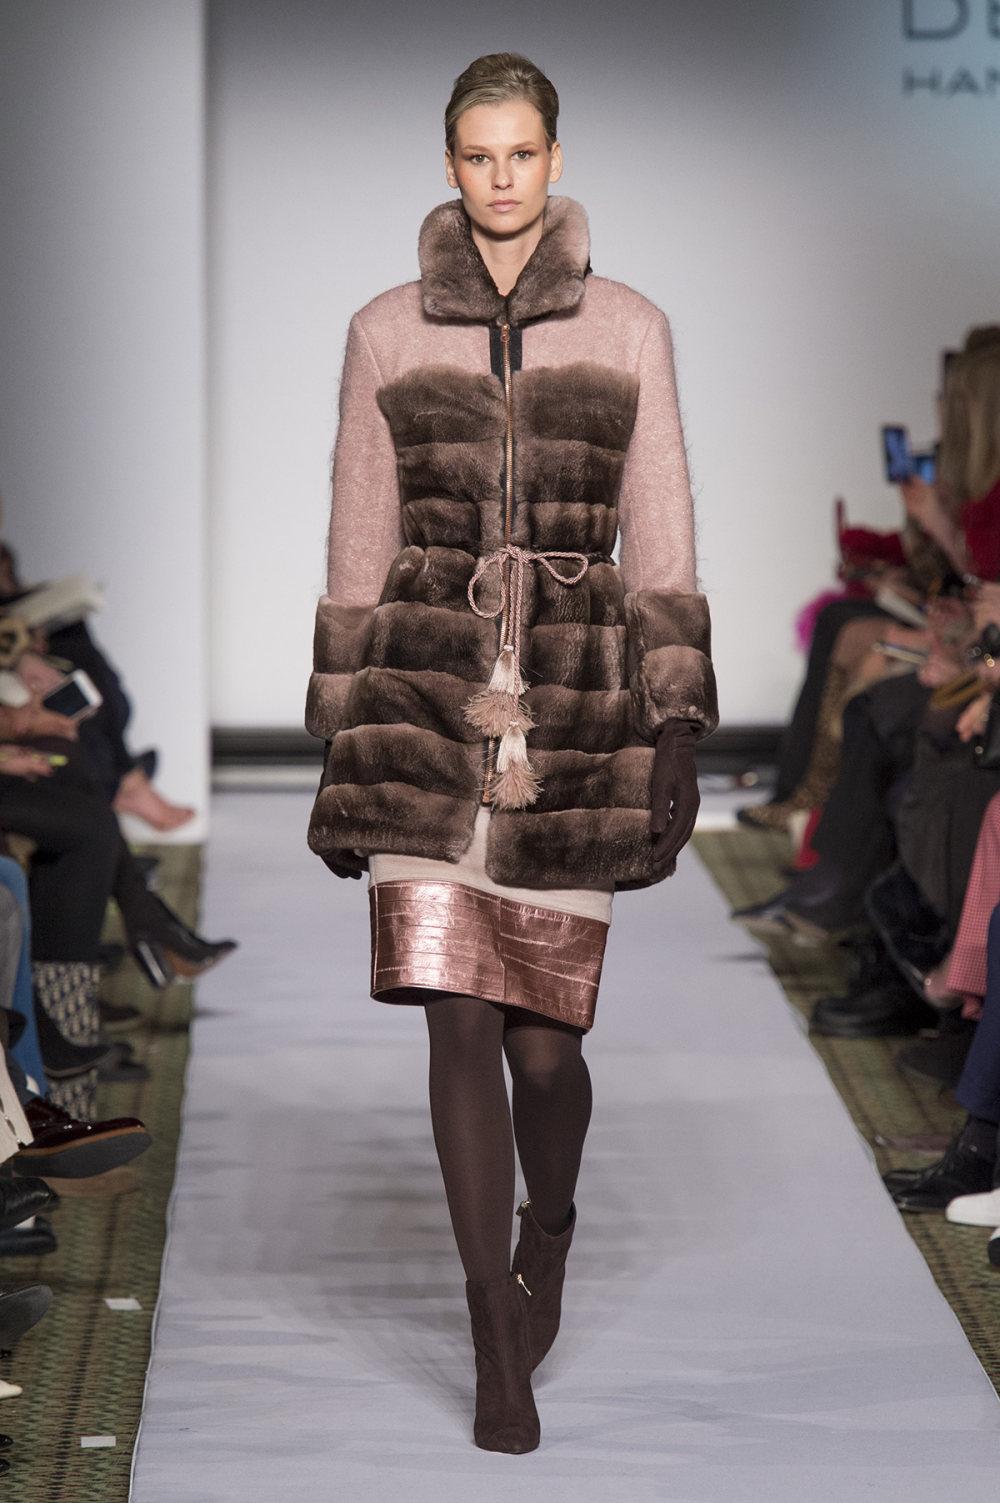 Carolina Herrera时装系列用鲜艳的颜色充满智能的黑白色调-37.jpg